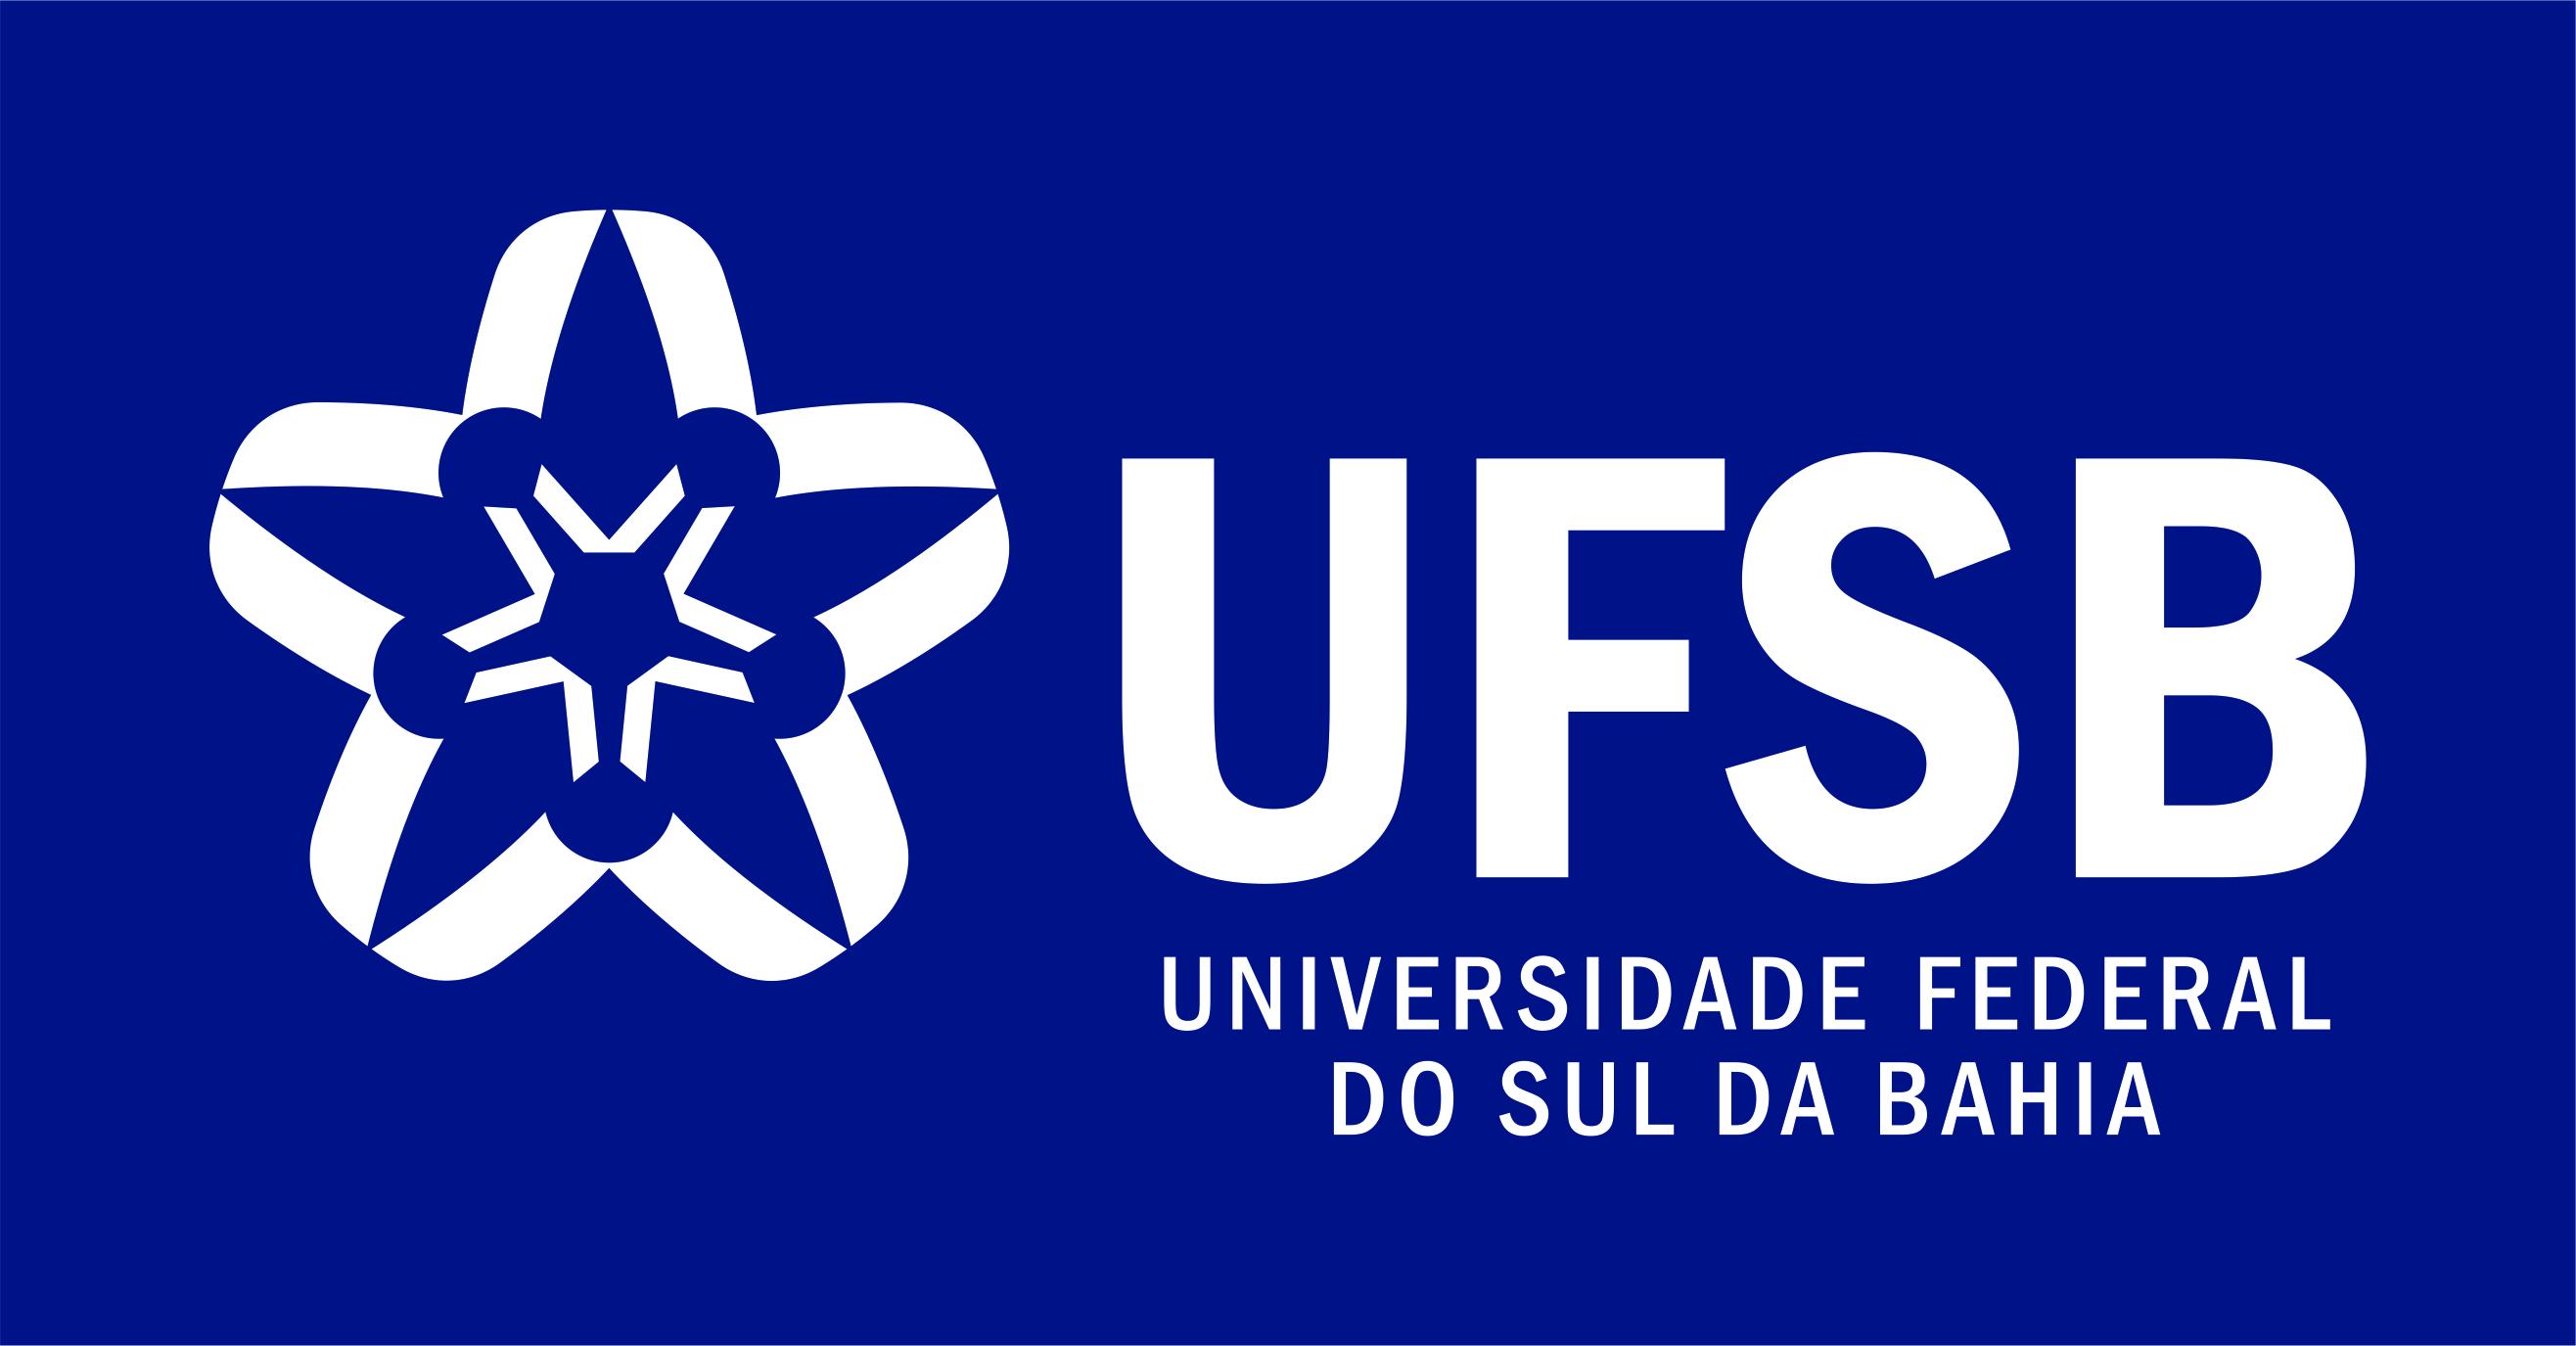 Assinatura Azul UFSB Oficial Horizontal RGB